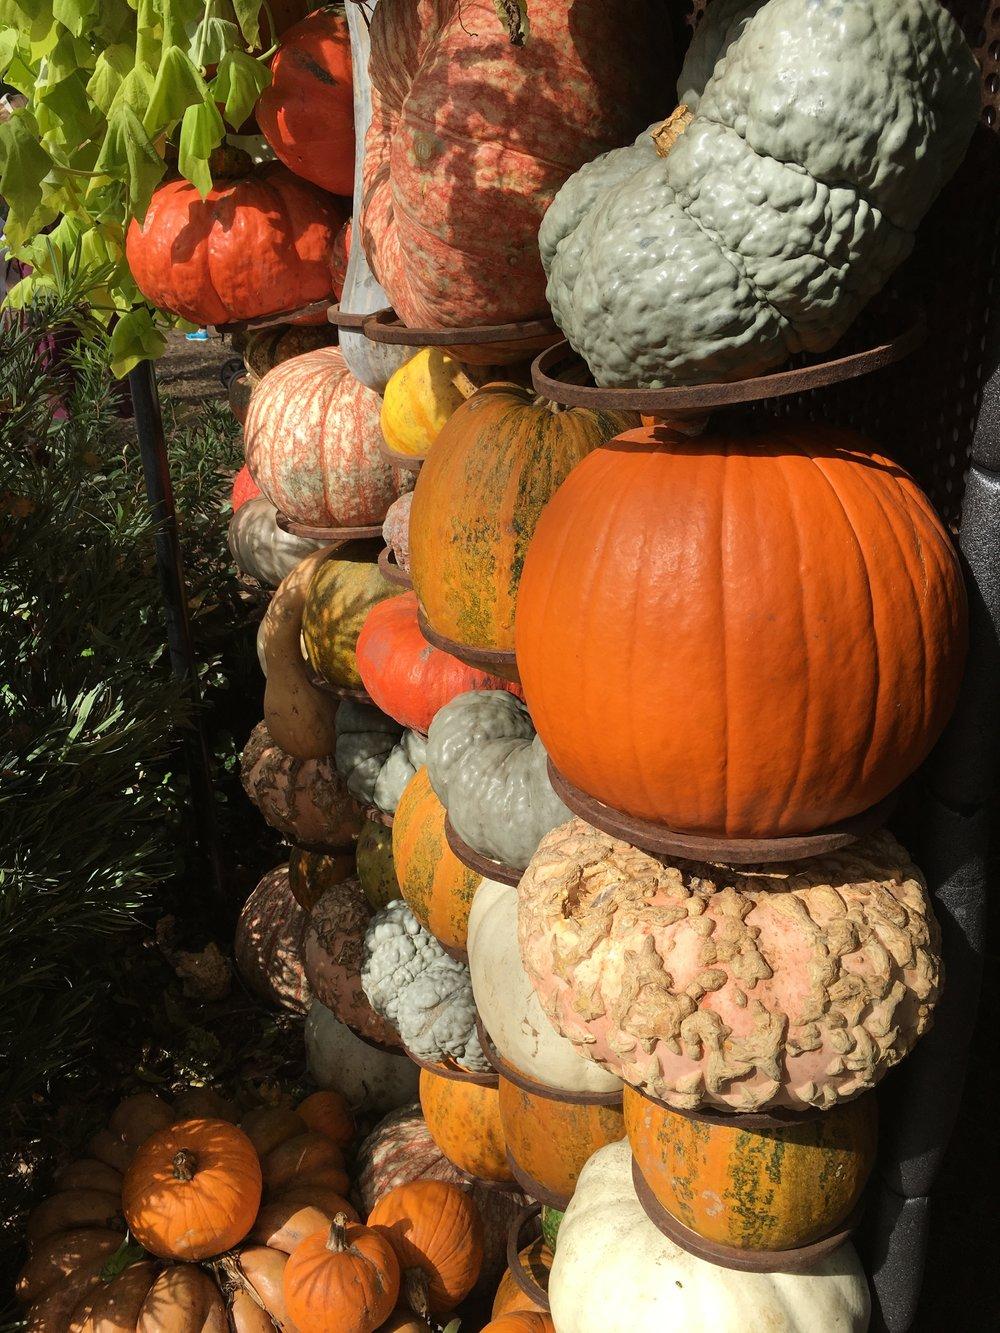 Gourd Art at Dallas Arboretum and Botanical Garden, TX